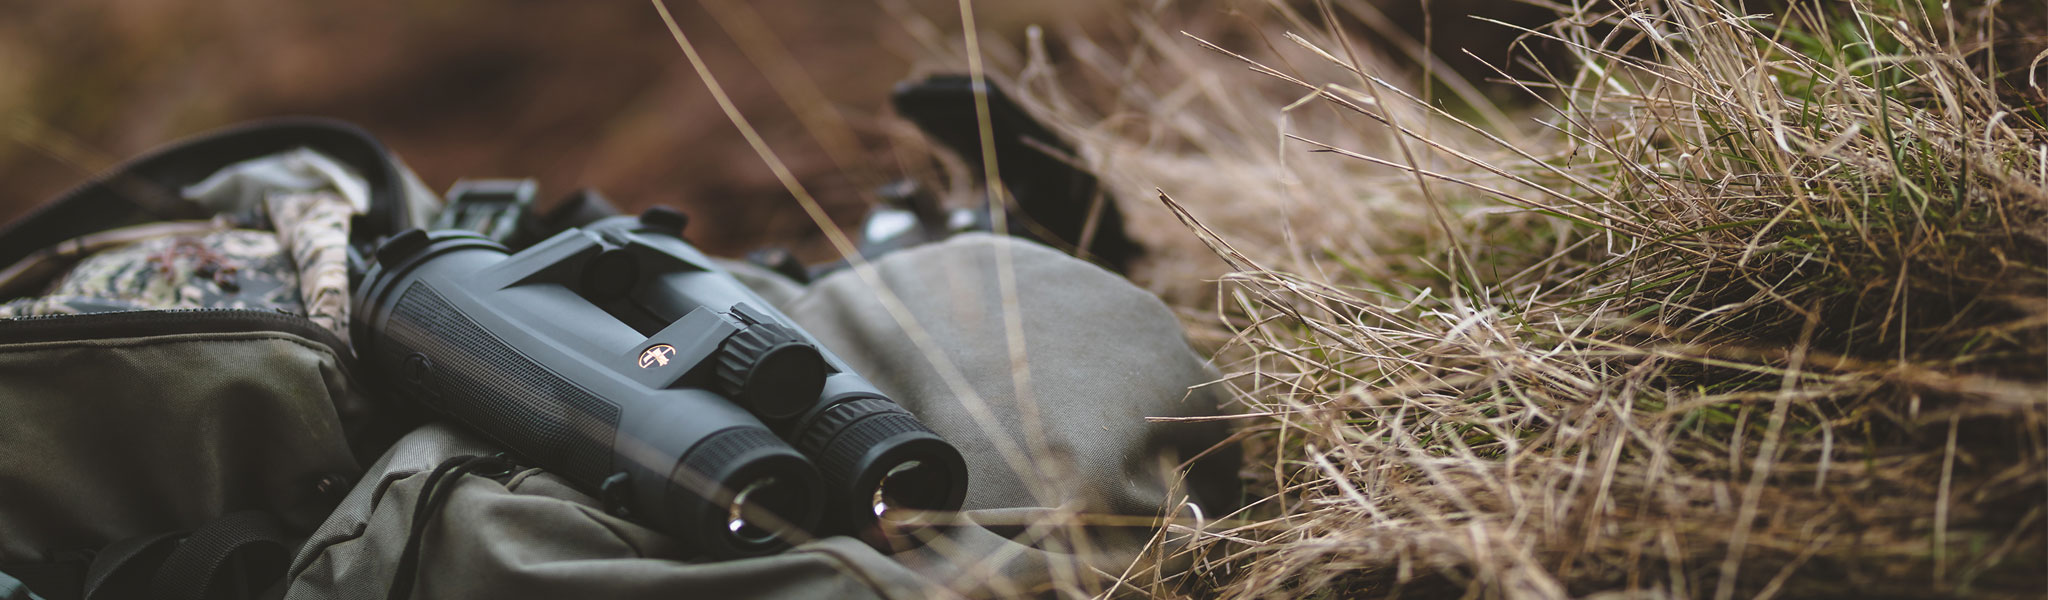 Binoculars grass bag